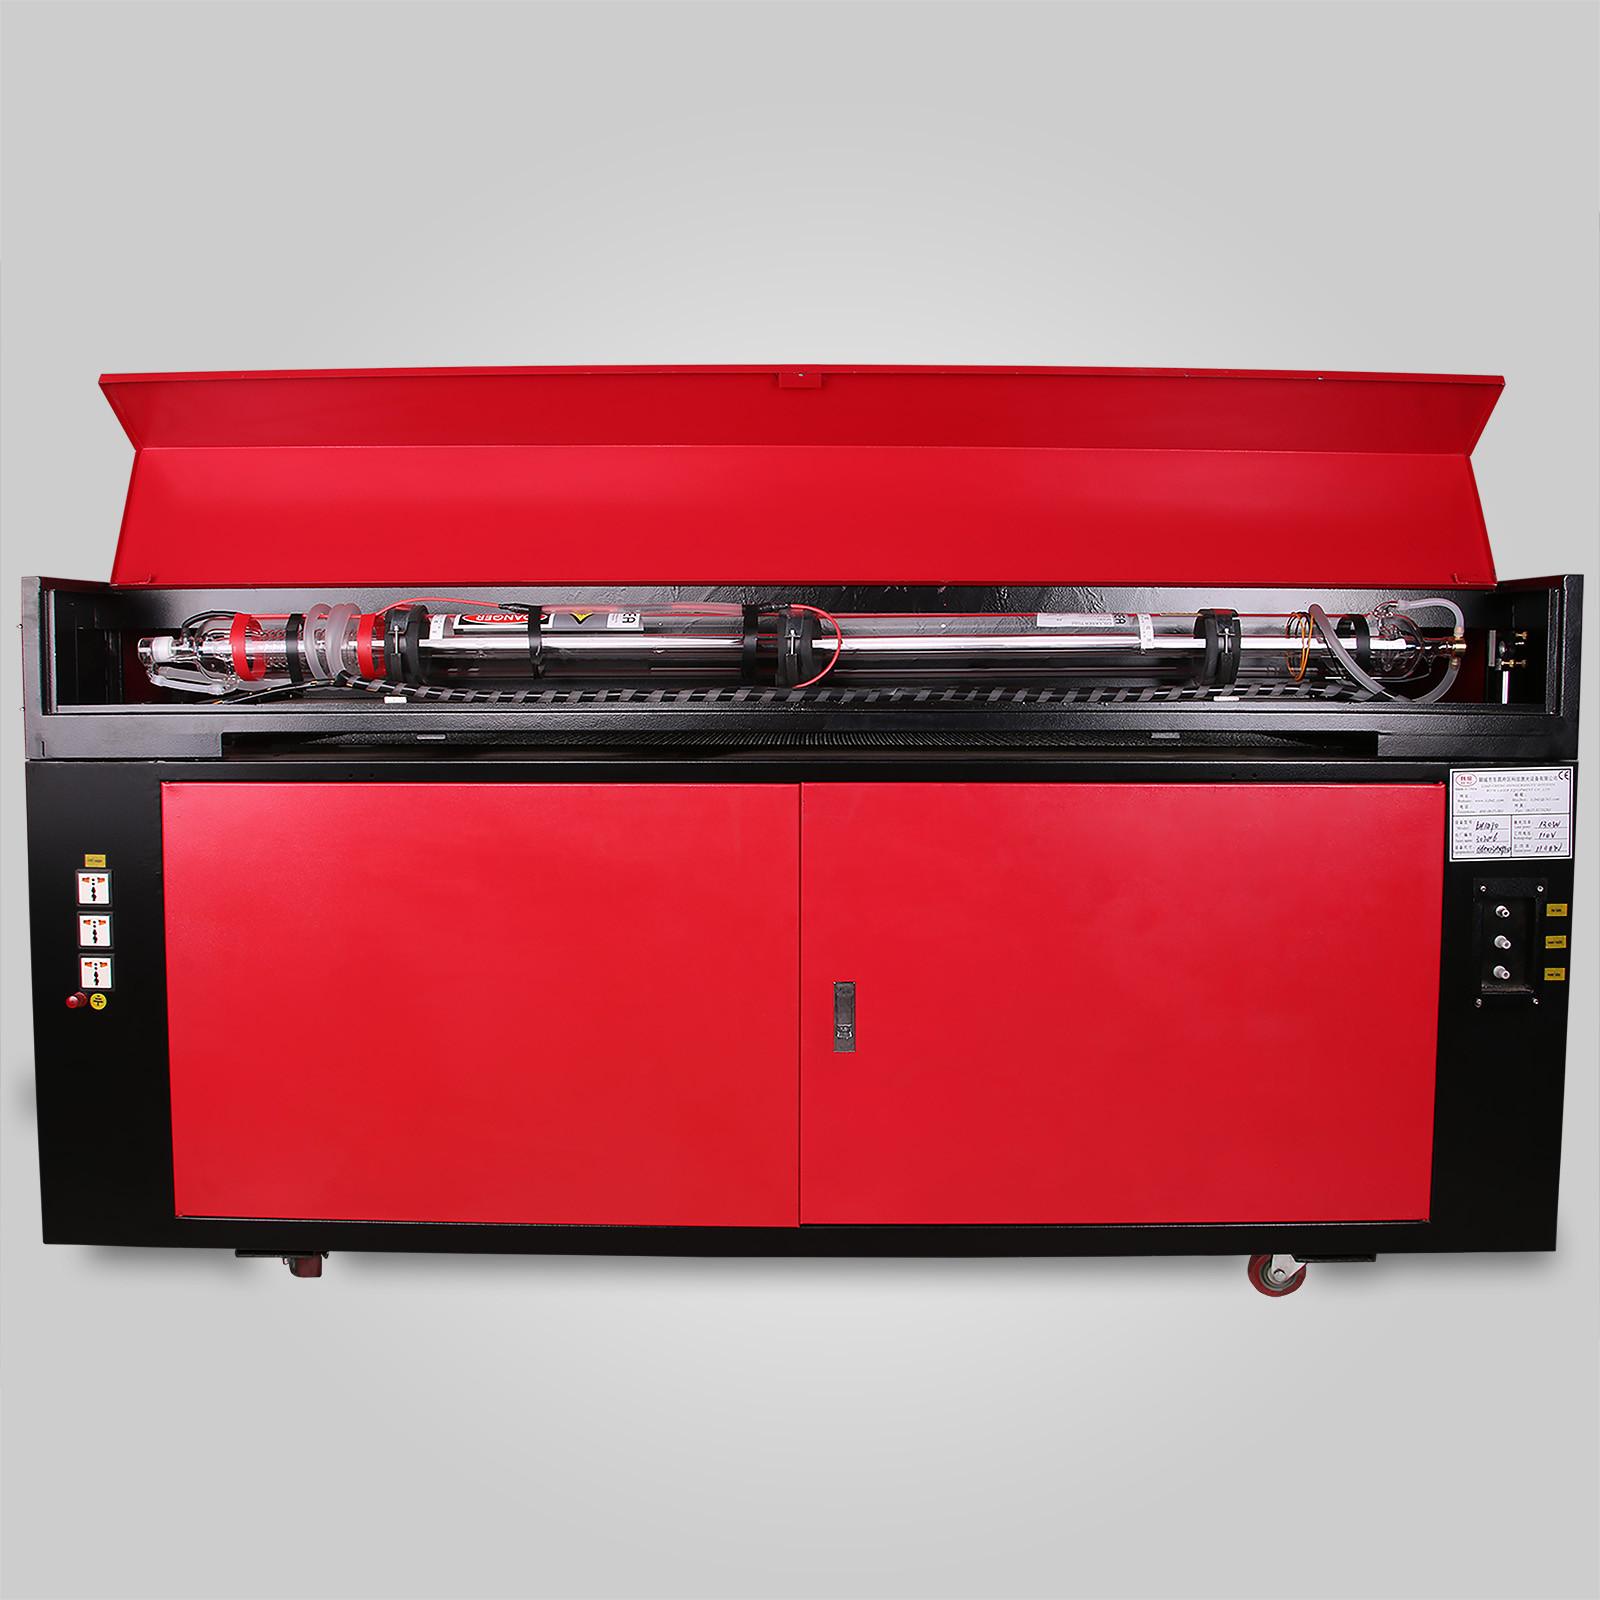 Macchina-per-Incisione-Laser-CO2-40-130W-Asse-Rotante-Tagliatrice-Incisore miniatura 78